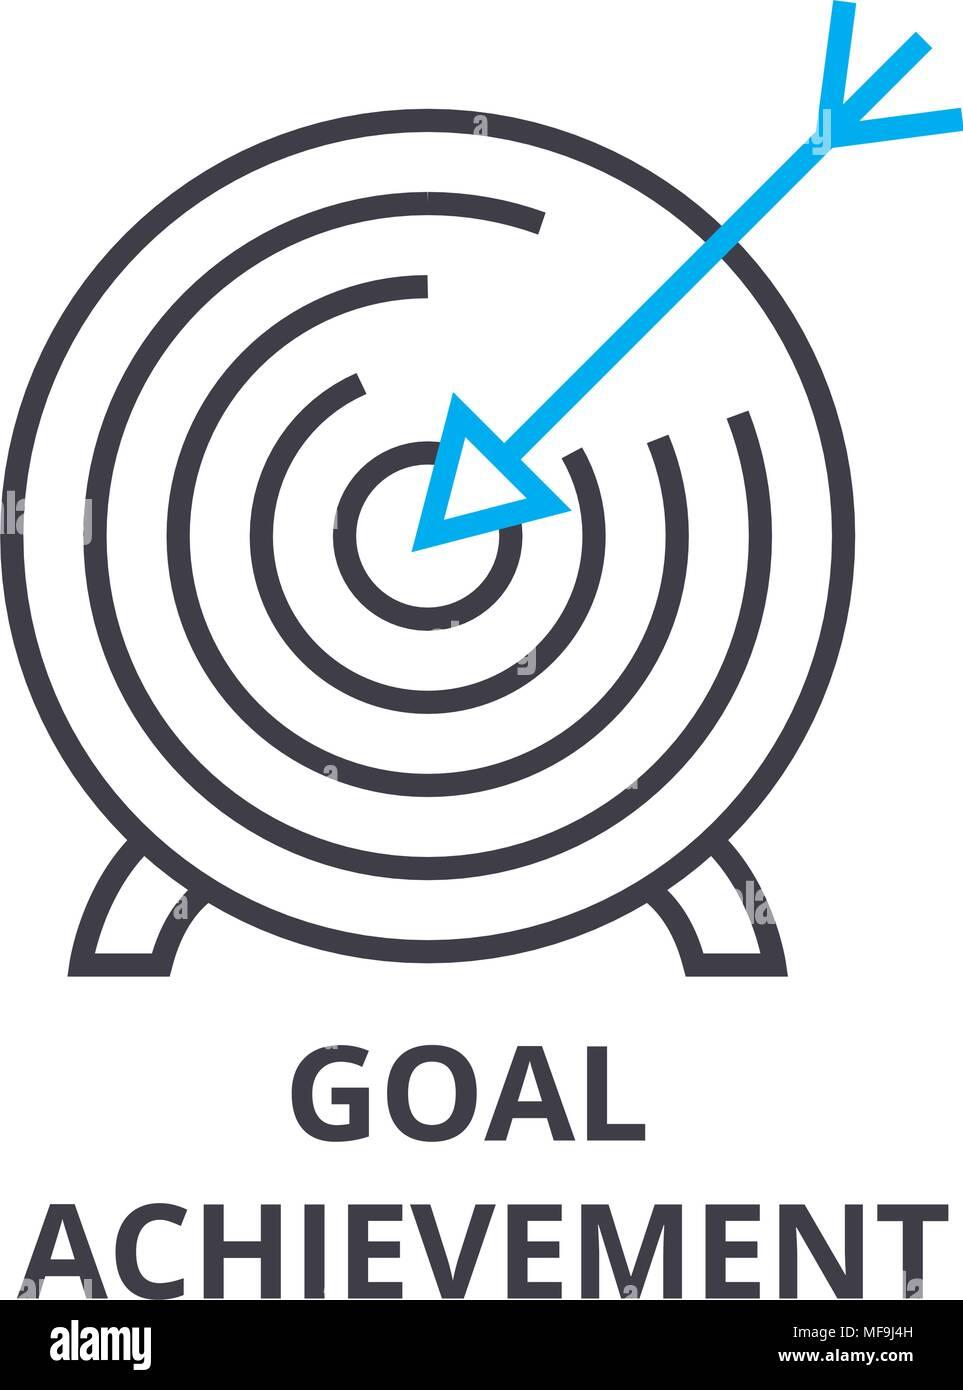 Goal Achievement Thin Line Icon Sign Symbol Illustation Linear Concept Vector